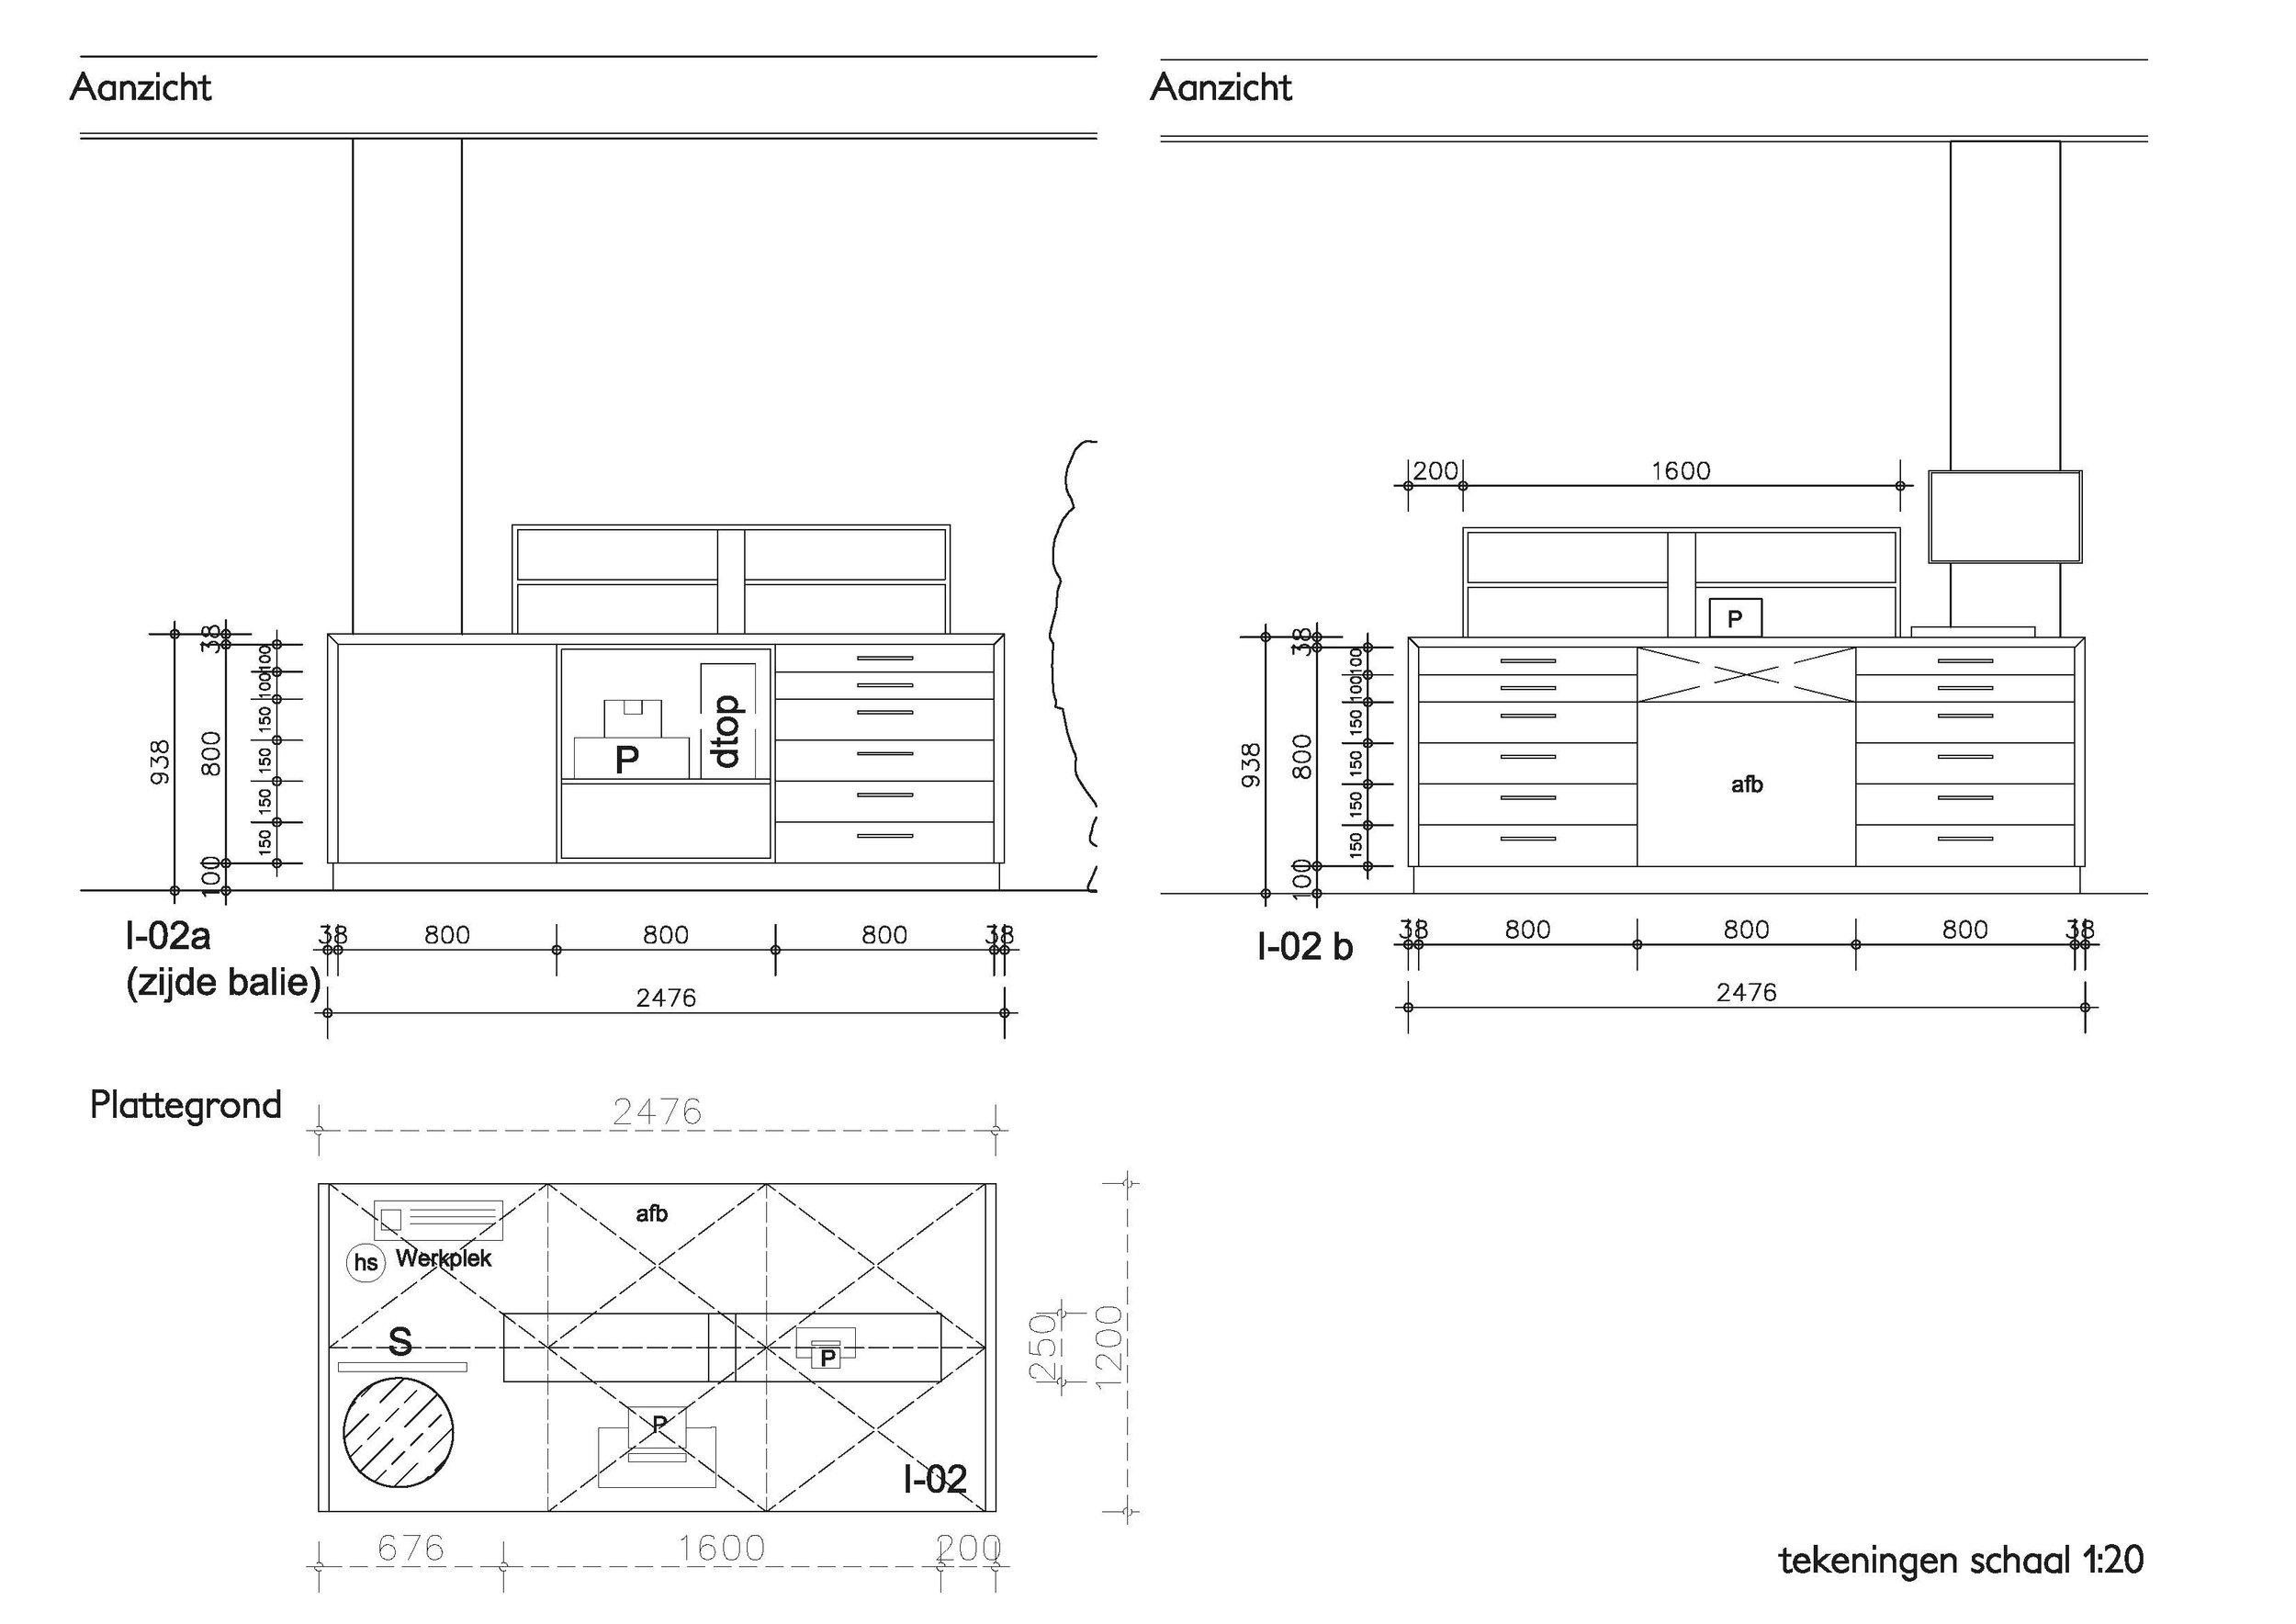 09 151126_DO praktijk_A3boek interieurbouw DEFINITIEF tek eiland.jpg